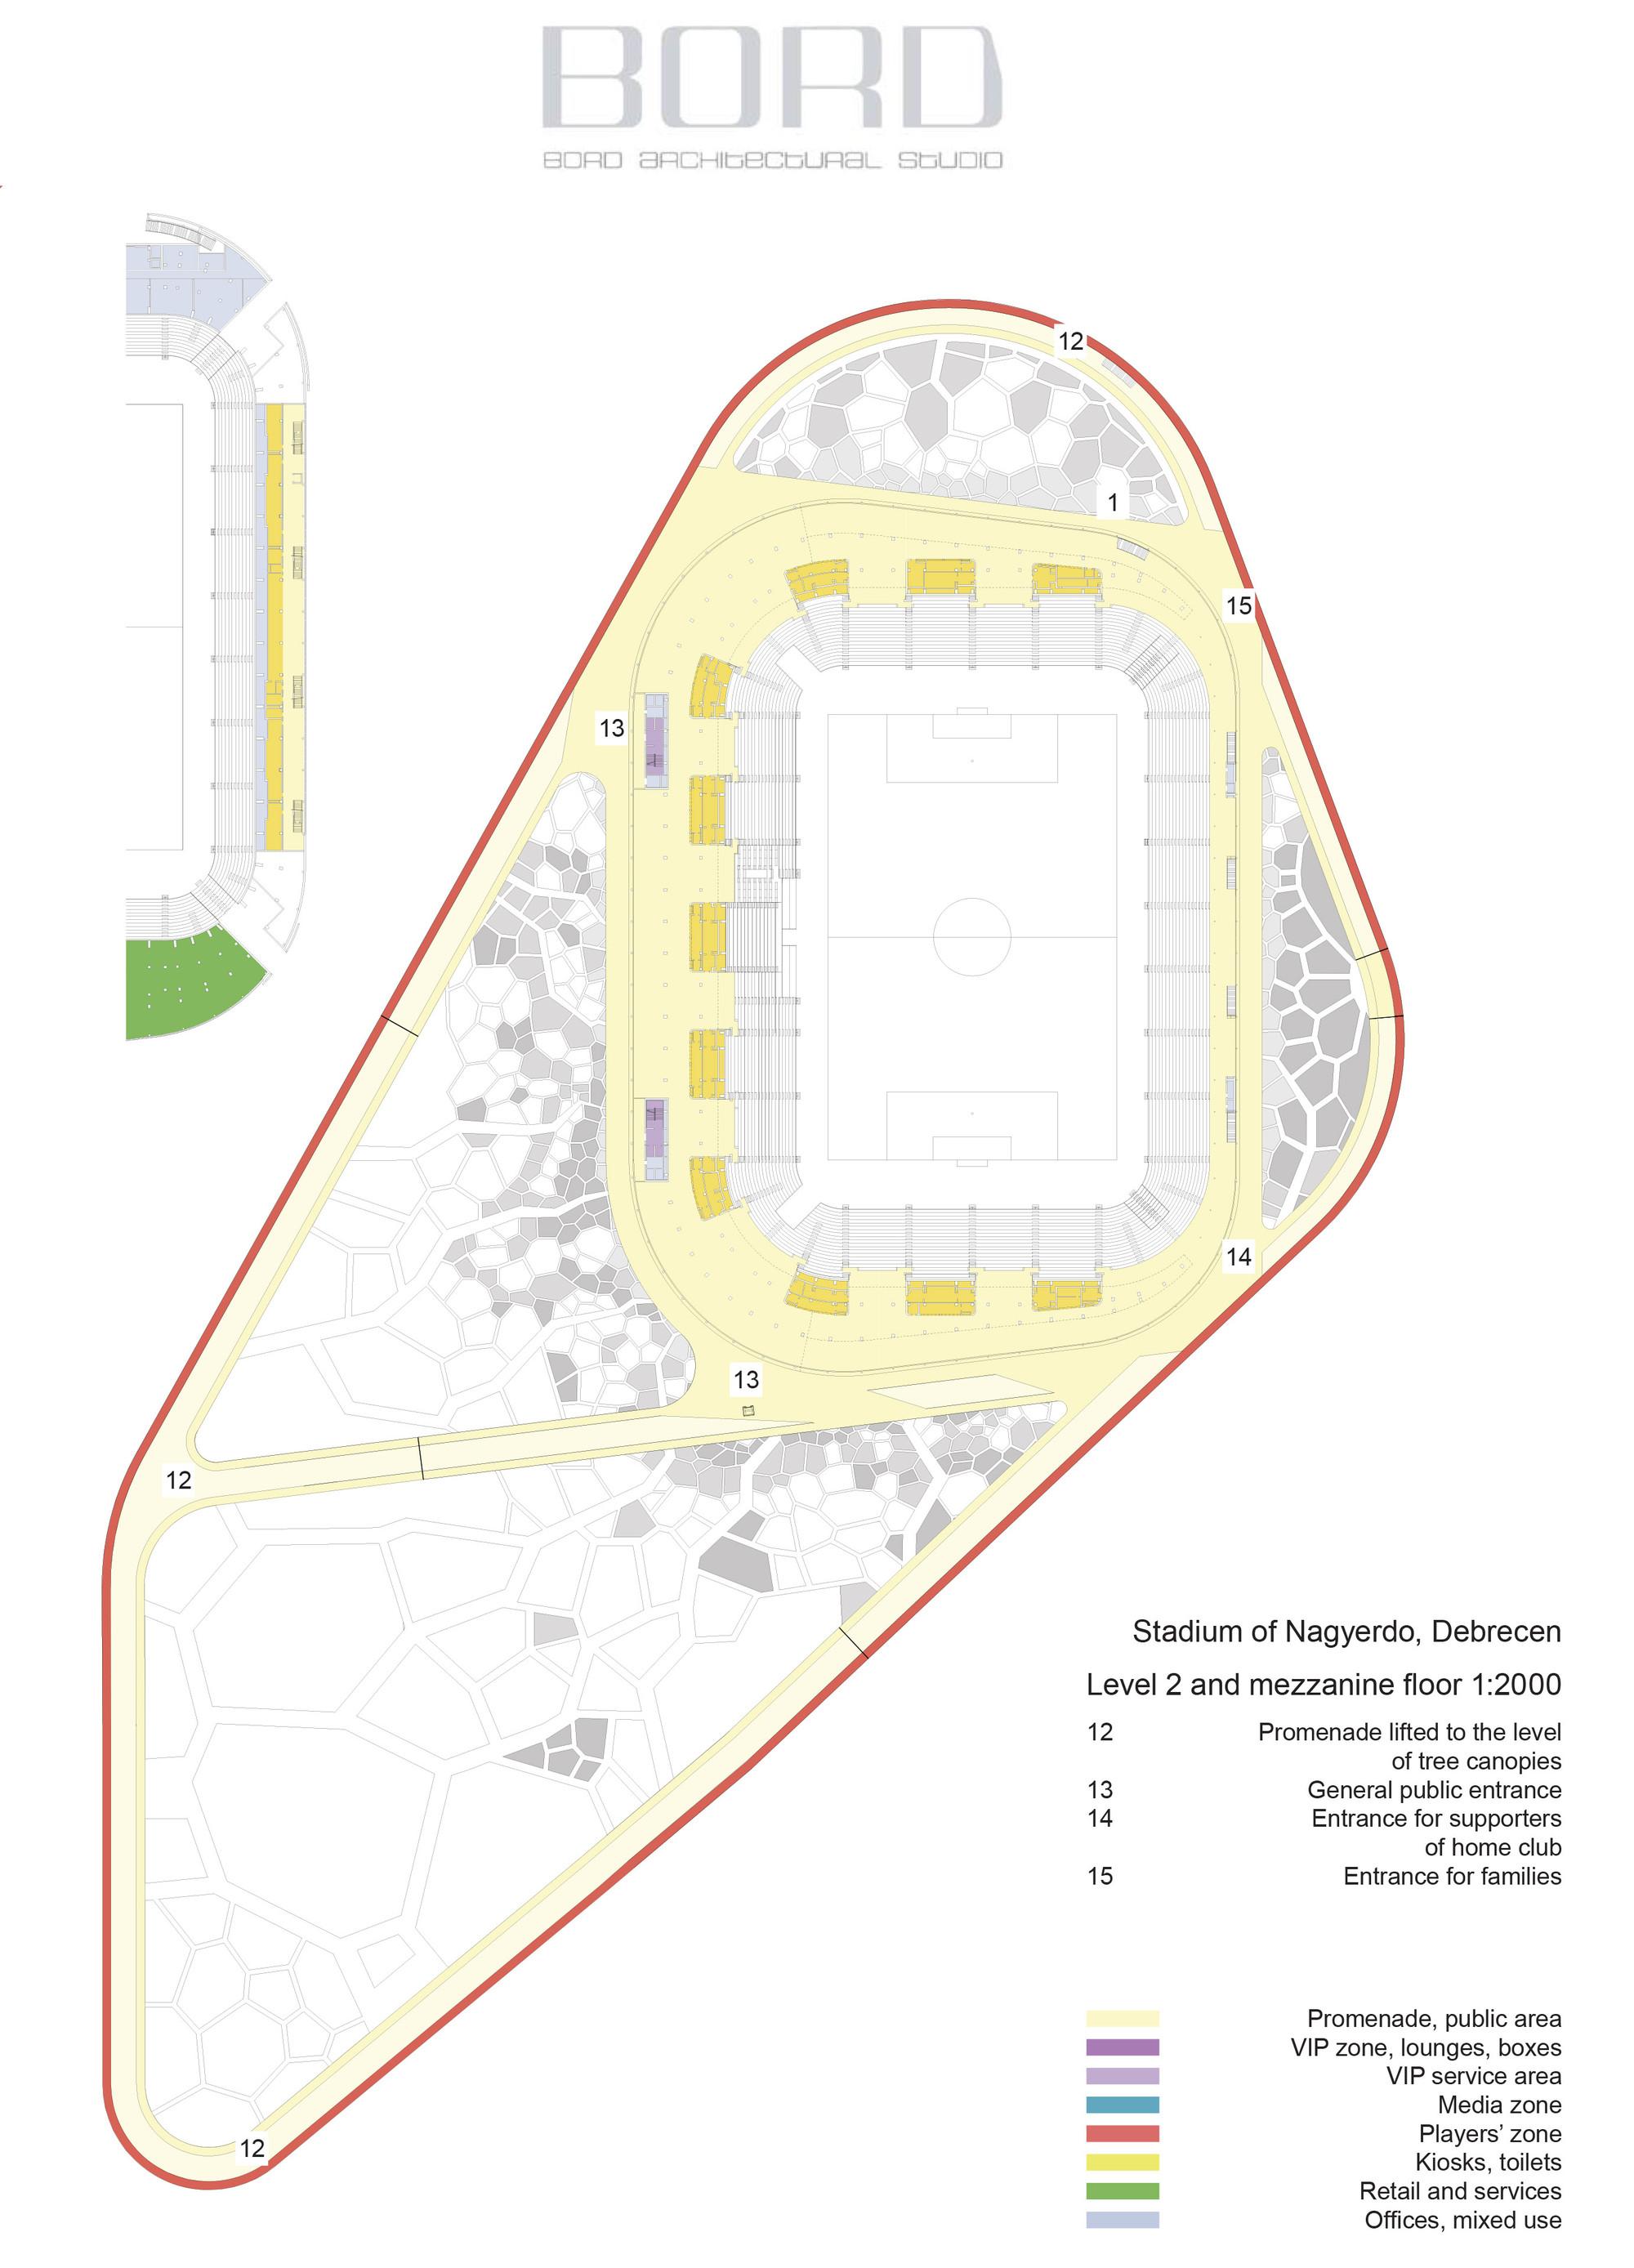 Austin City Council Approves Plan for $200M Soccer Stadium